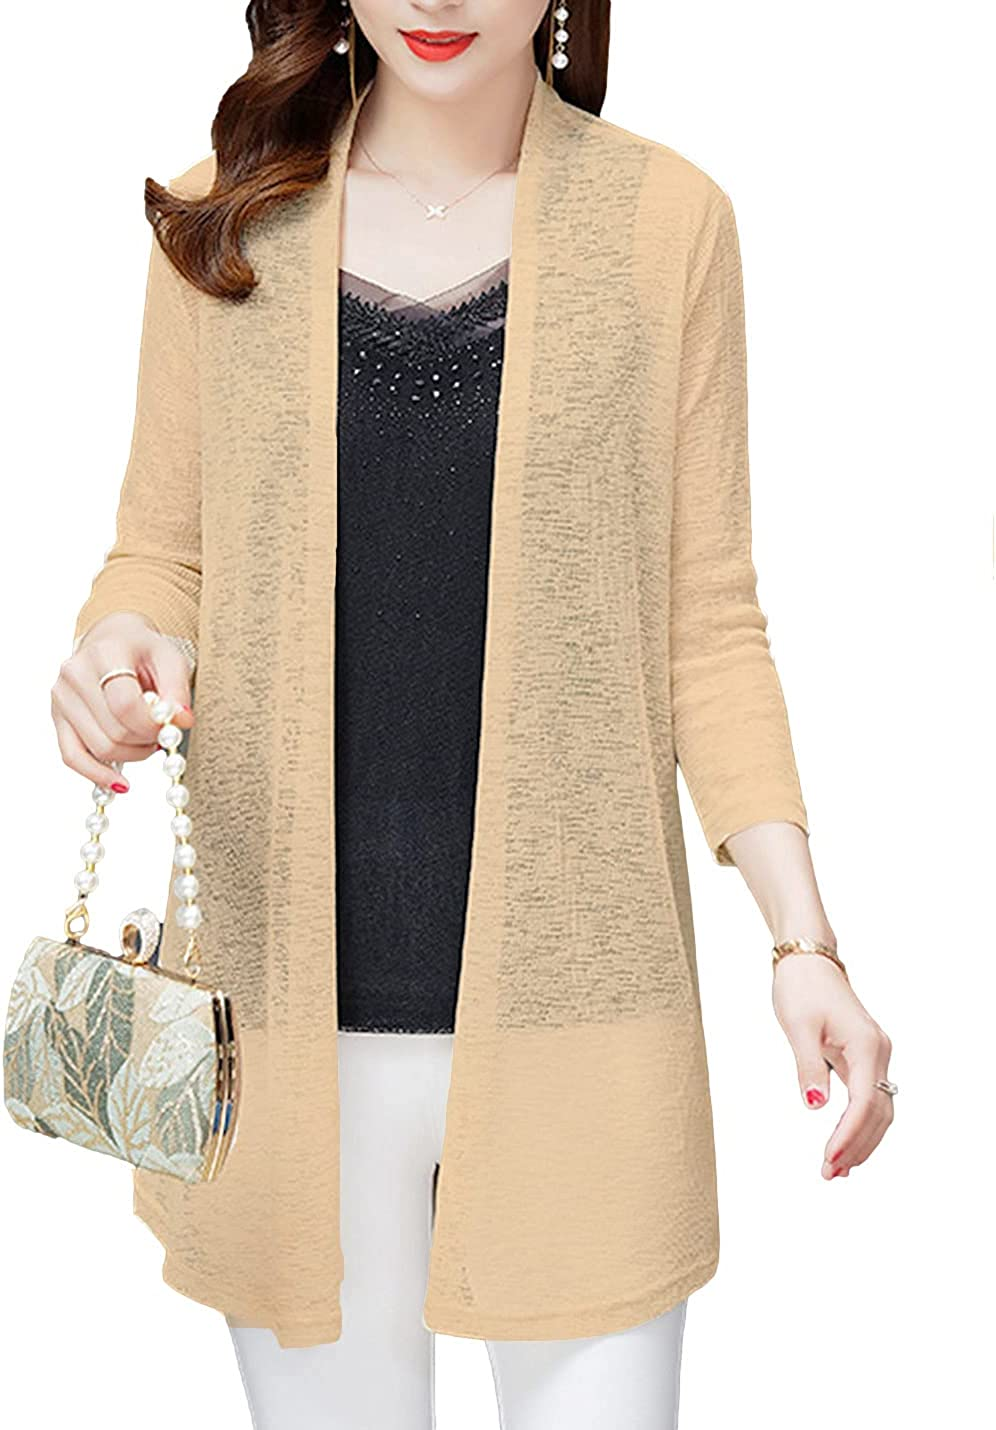 AMEBELLE Women's 3/4 Sleeve Mid Long Cotton Linen Open Front Sheer Cardigan Outwears